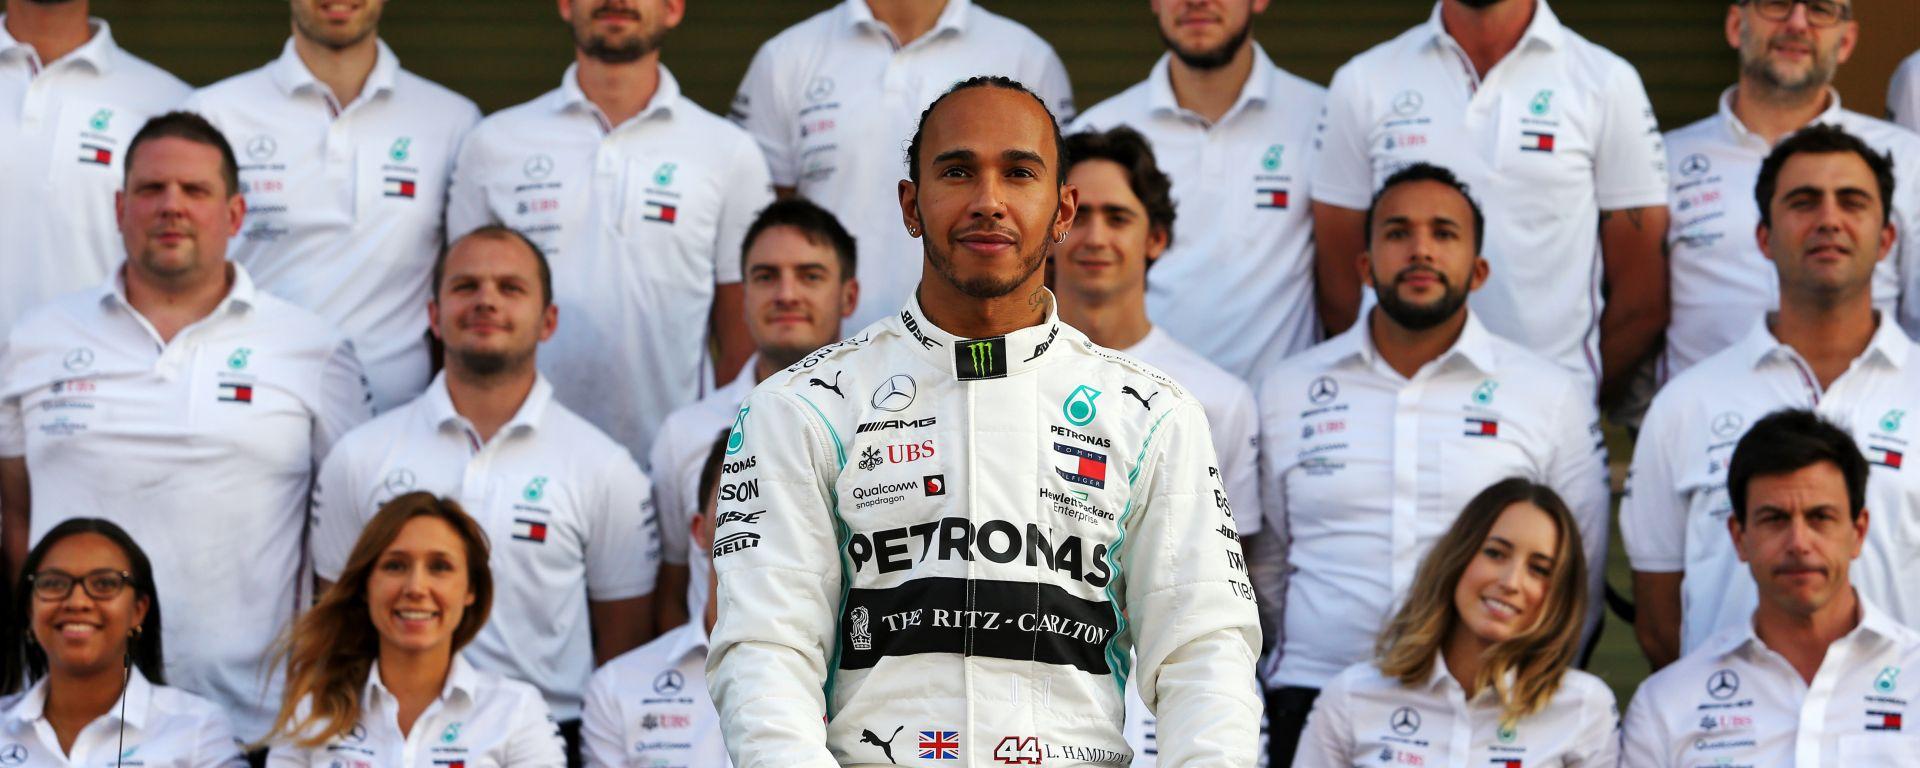 F1, GP Abu Dhabi 2019: Lewis Hamilton in posa con il team Mercedes